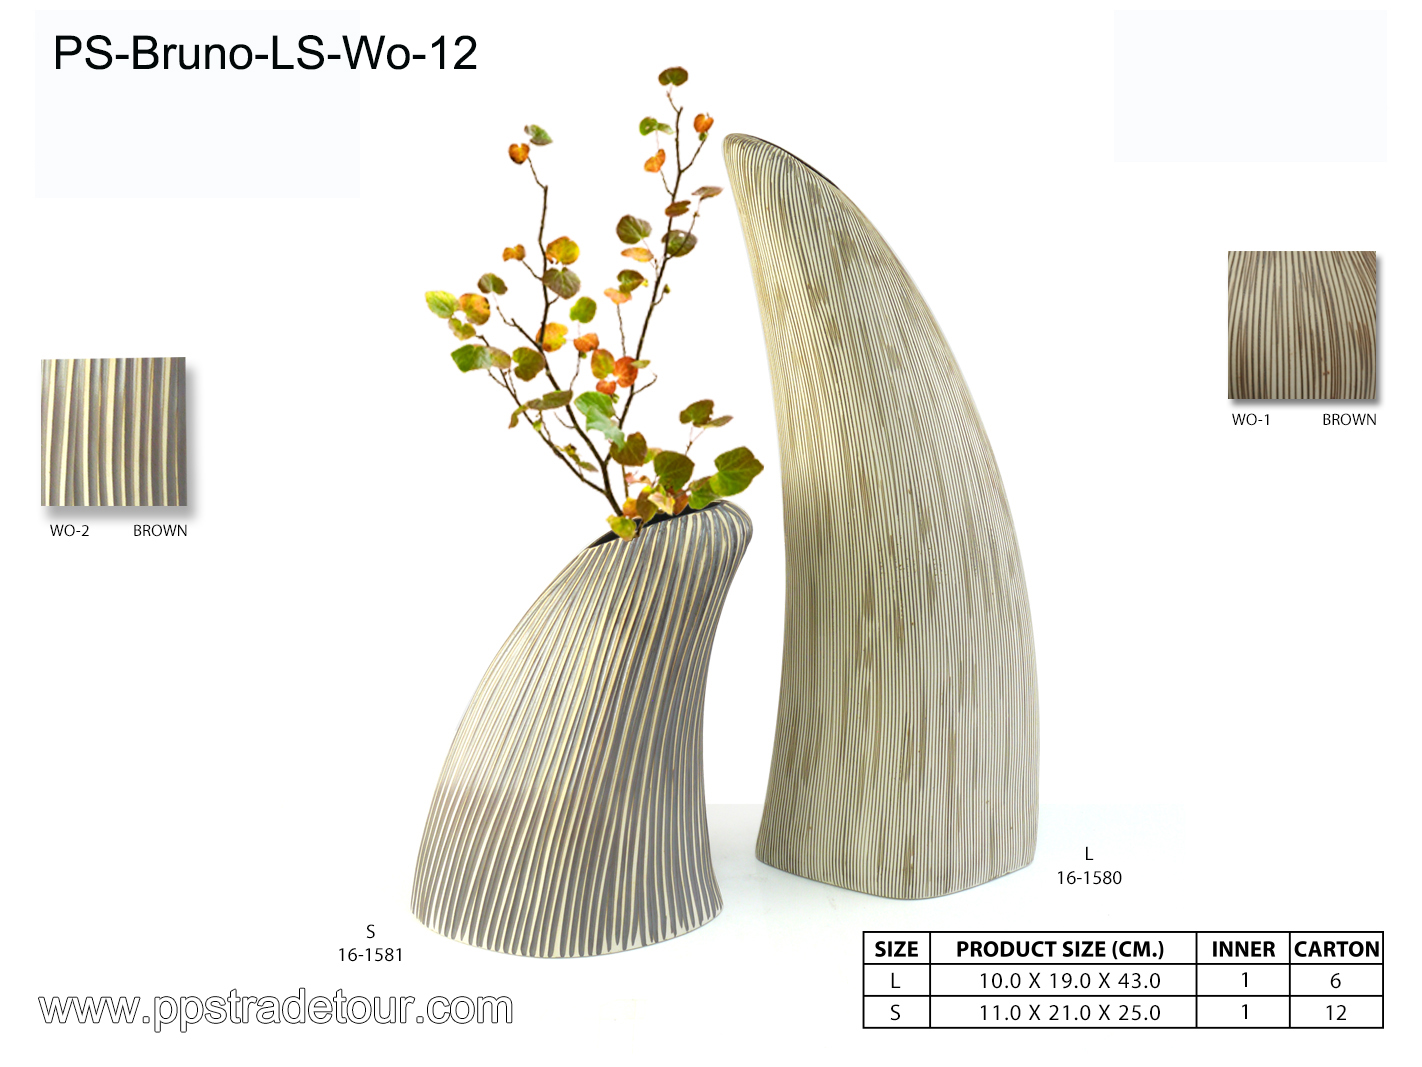 PSCV-Bruno-LS-WO-12